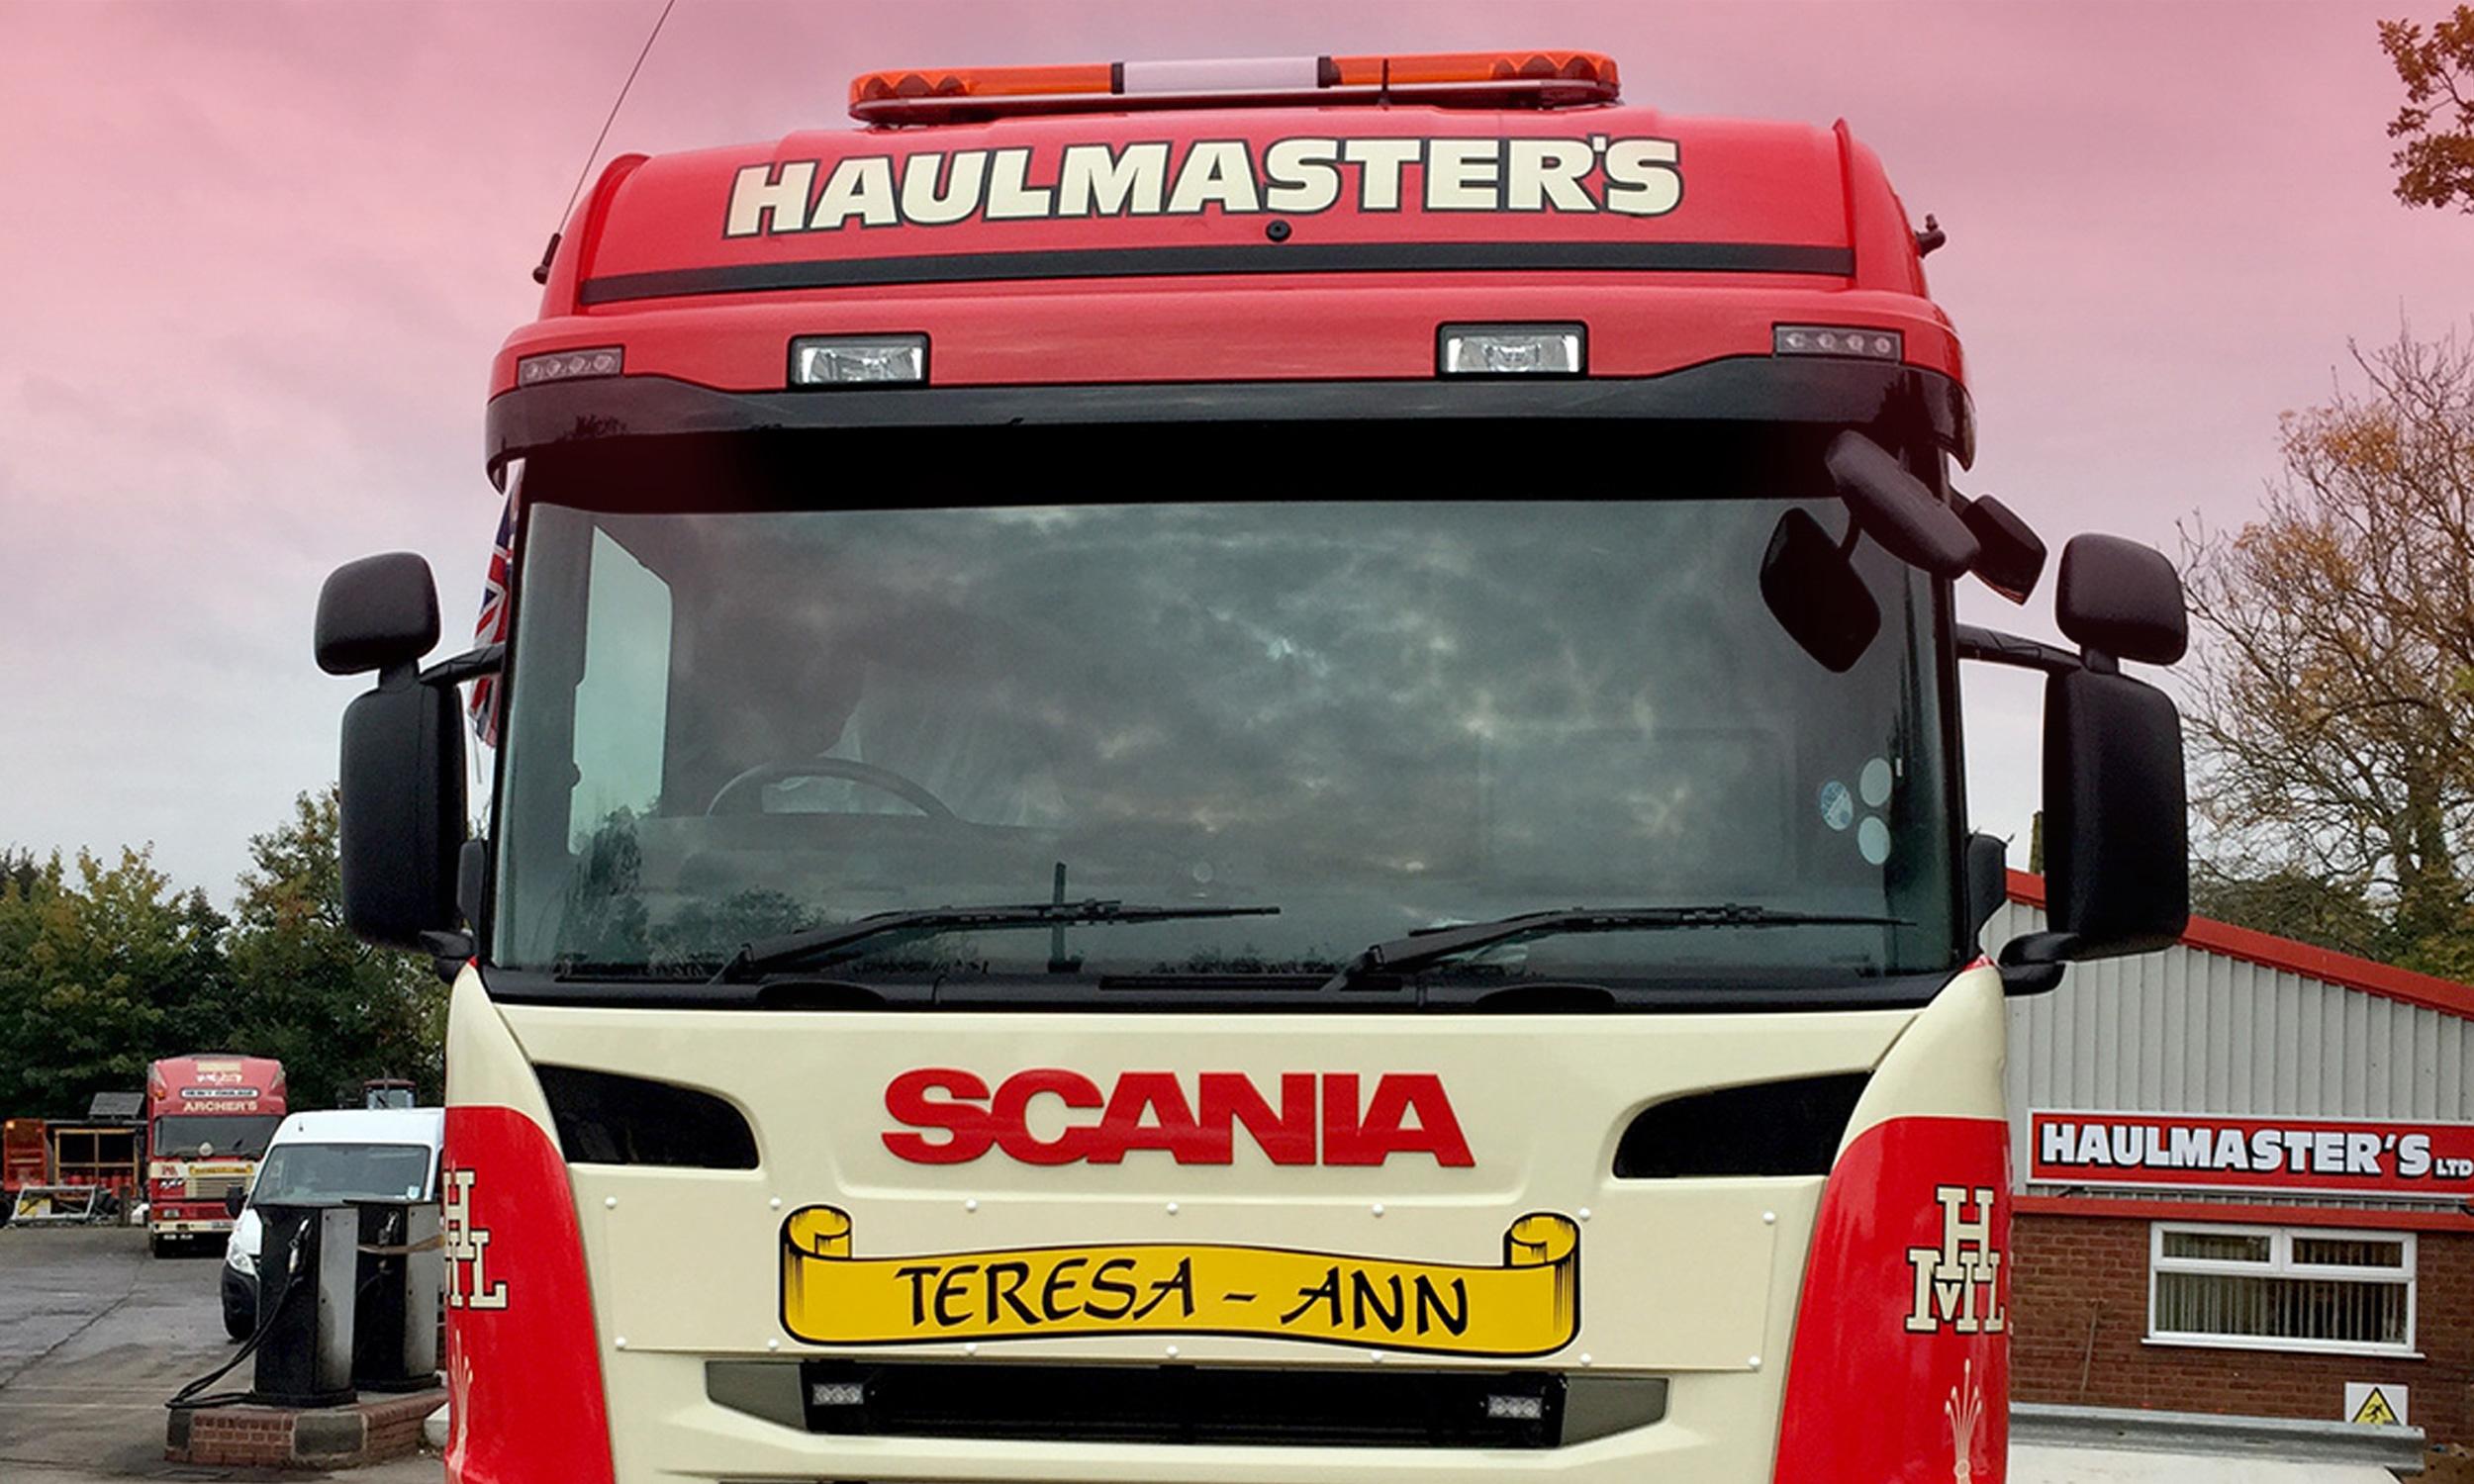 Haulmasters